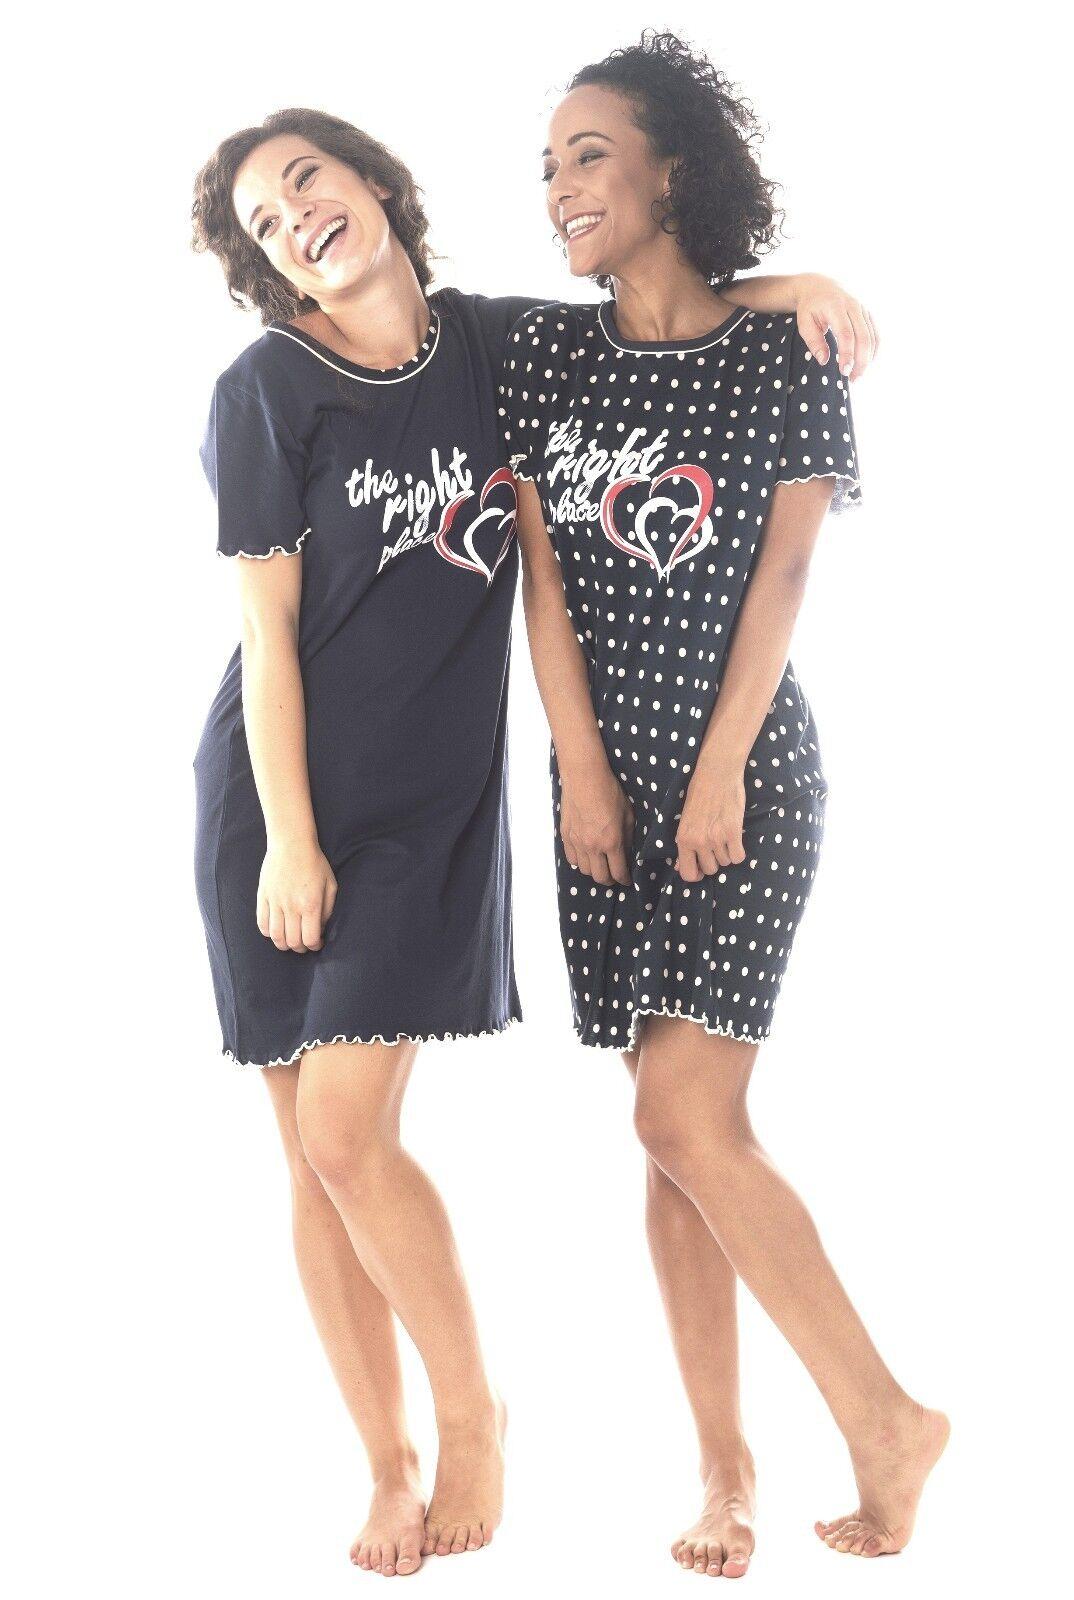 Damen Nachthemd 2 Stück = 1 Preis DF615V Kurzarm  100/% Baumwolle Jersey